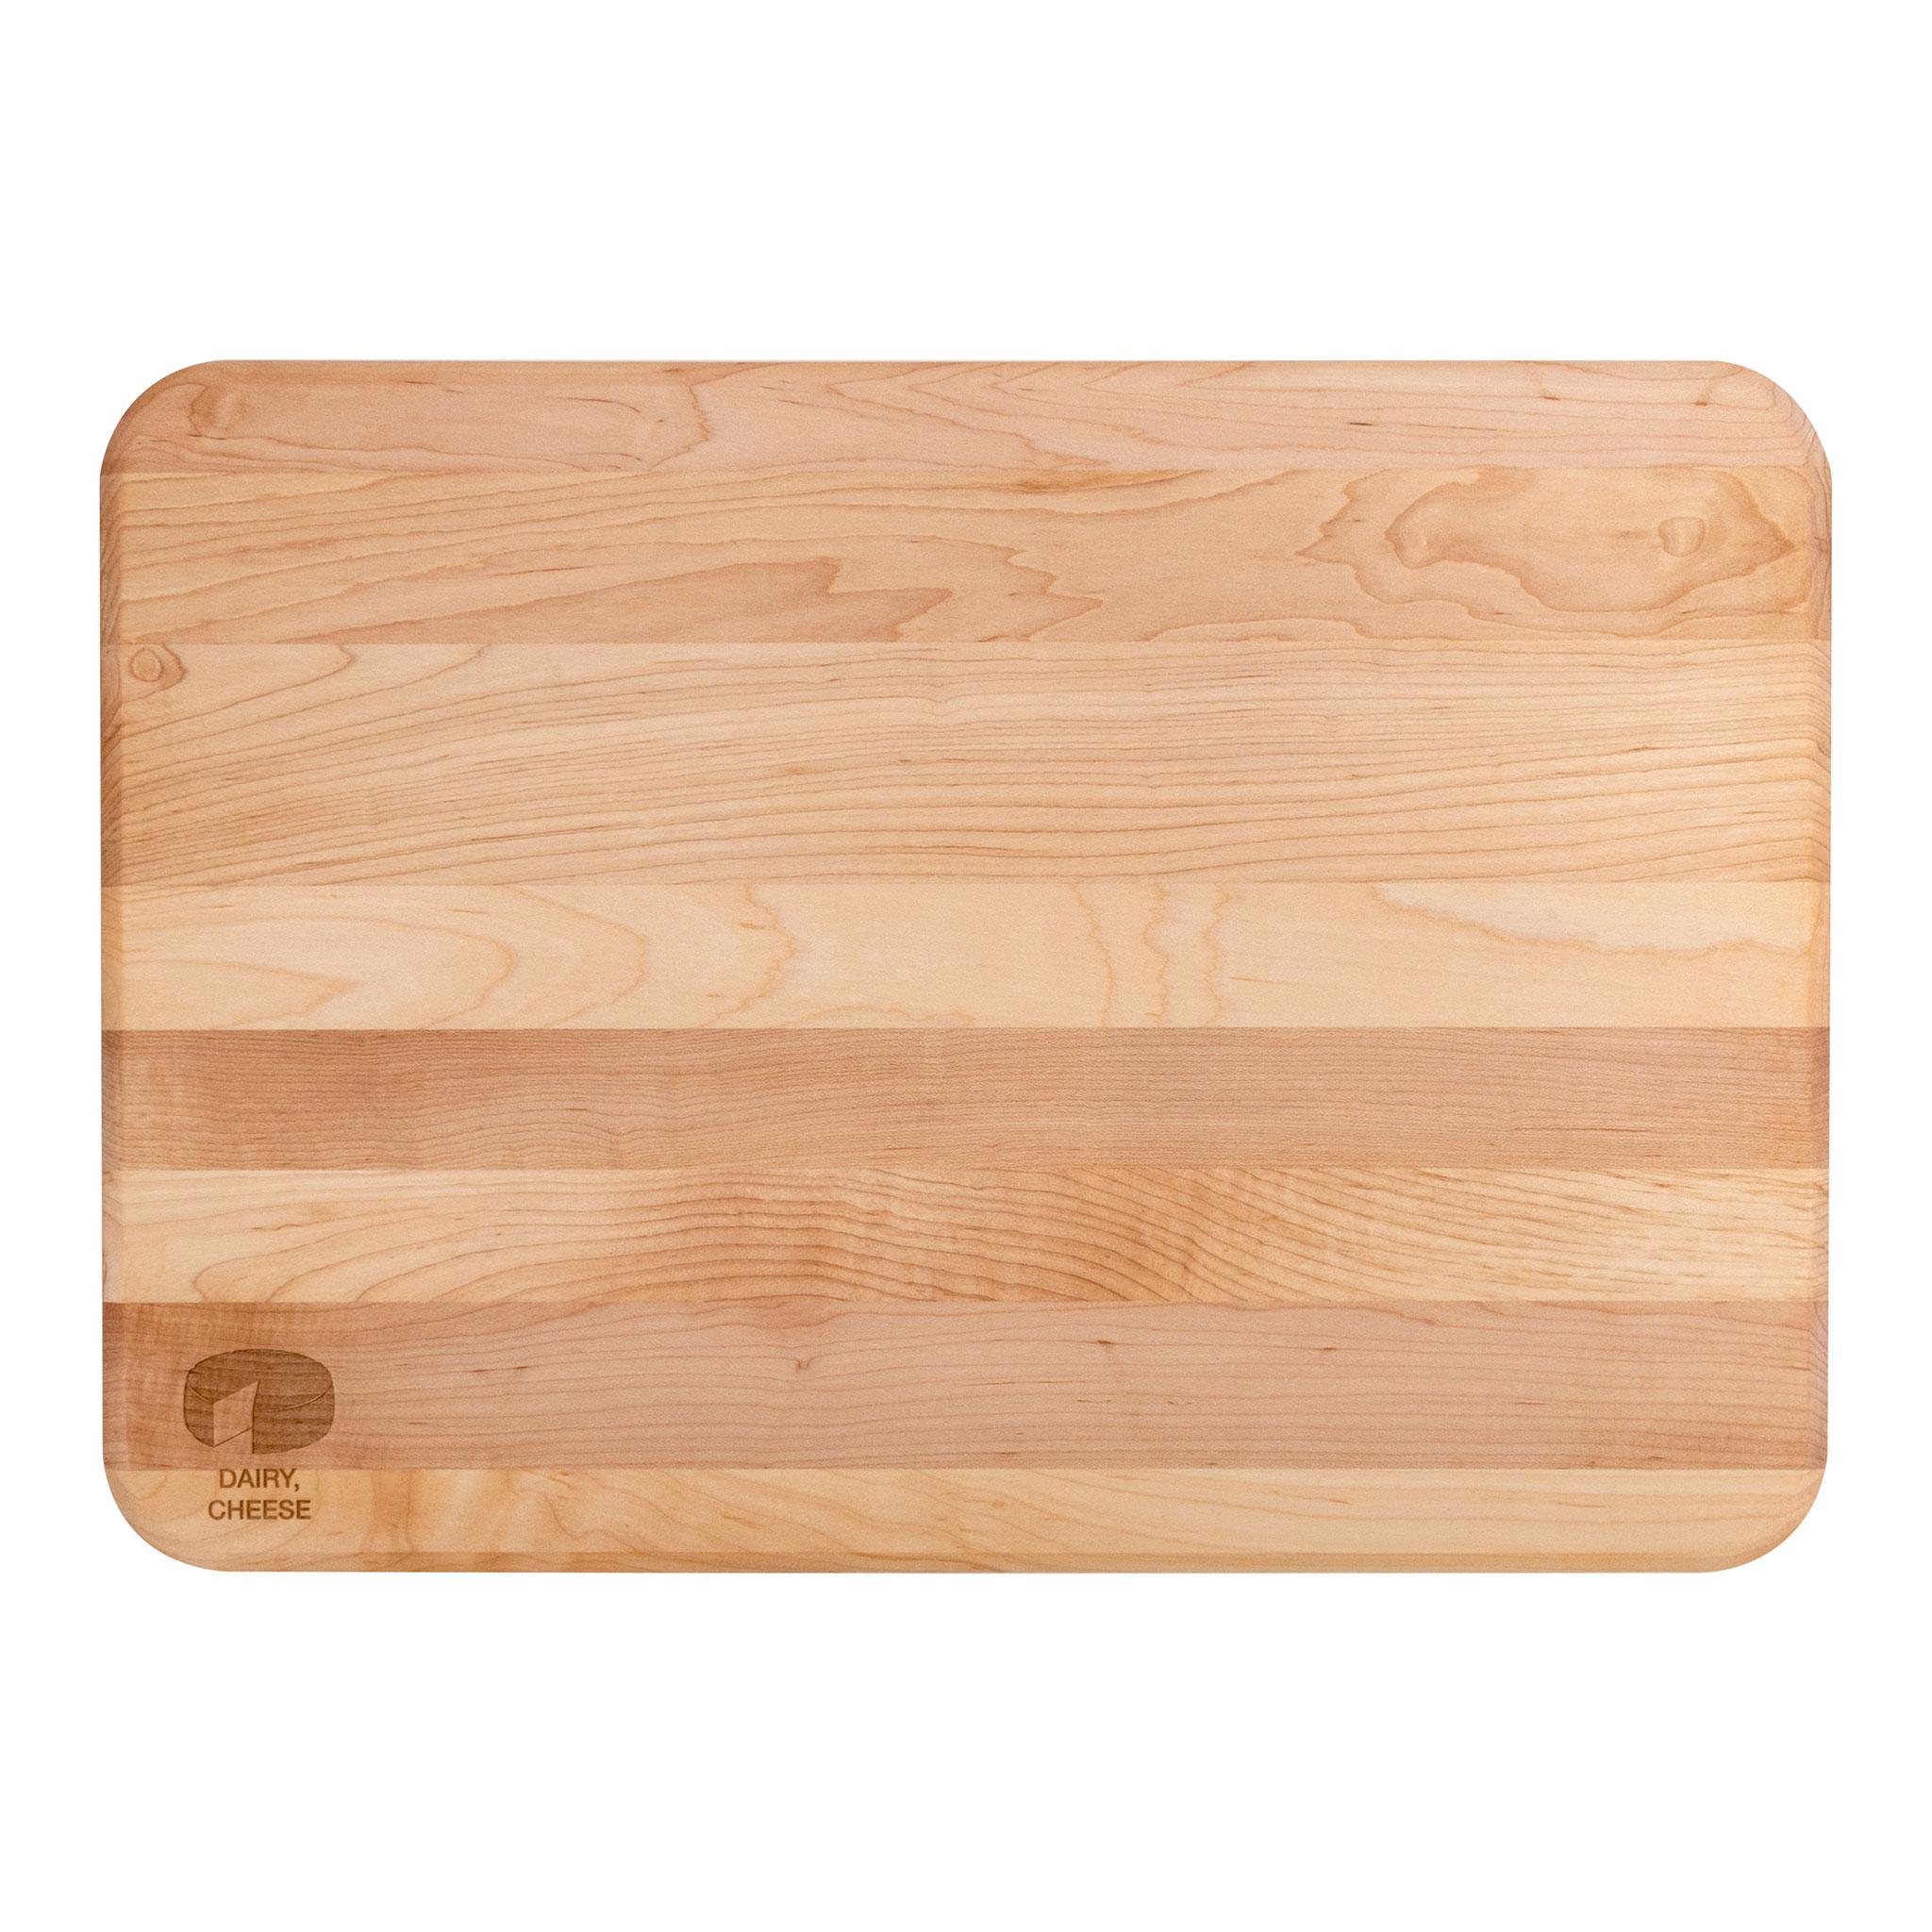 John Boos CB4C-M201401-DC cutting board, wood